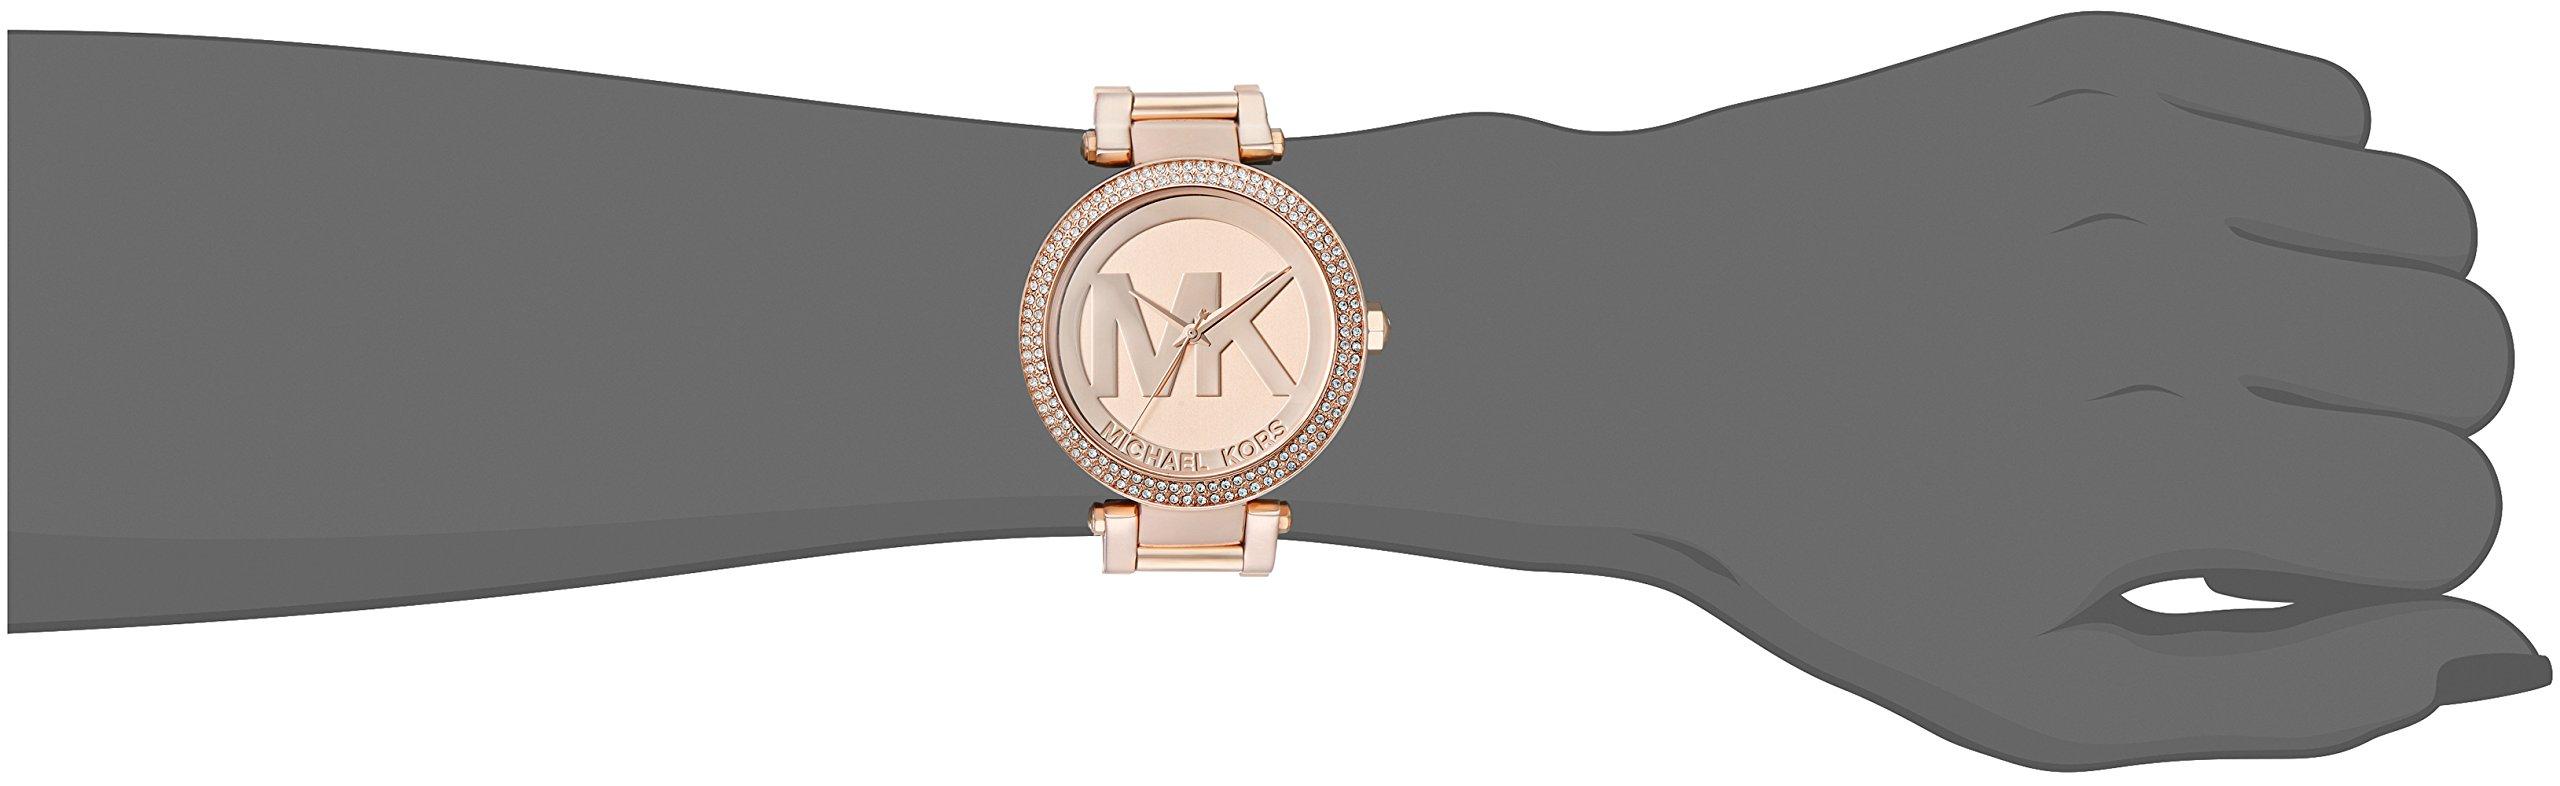 Michael-Kors-Damen-Uhren-MK5865